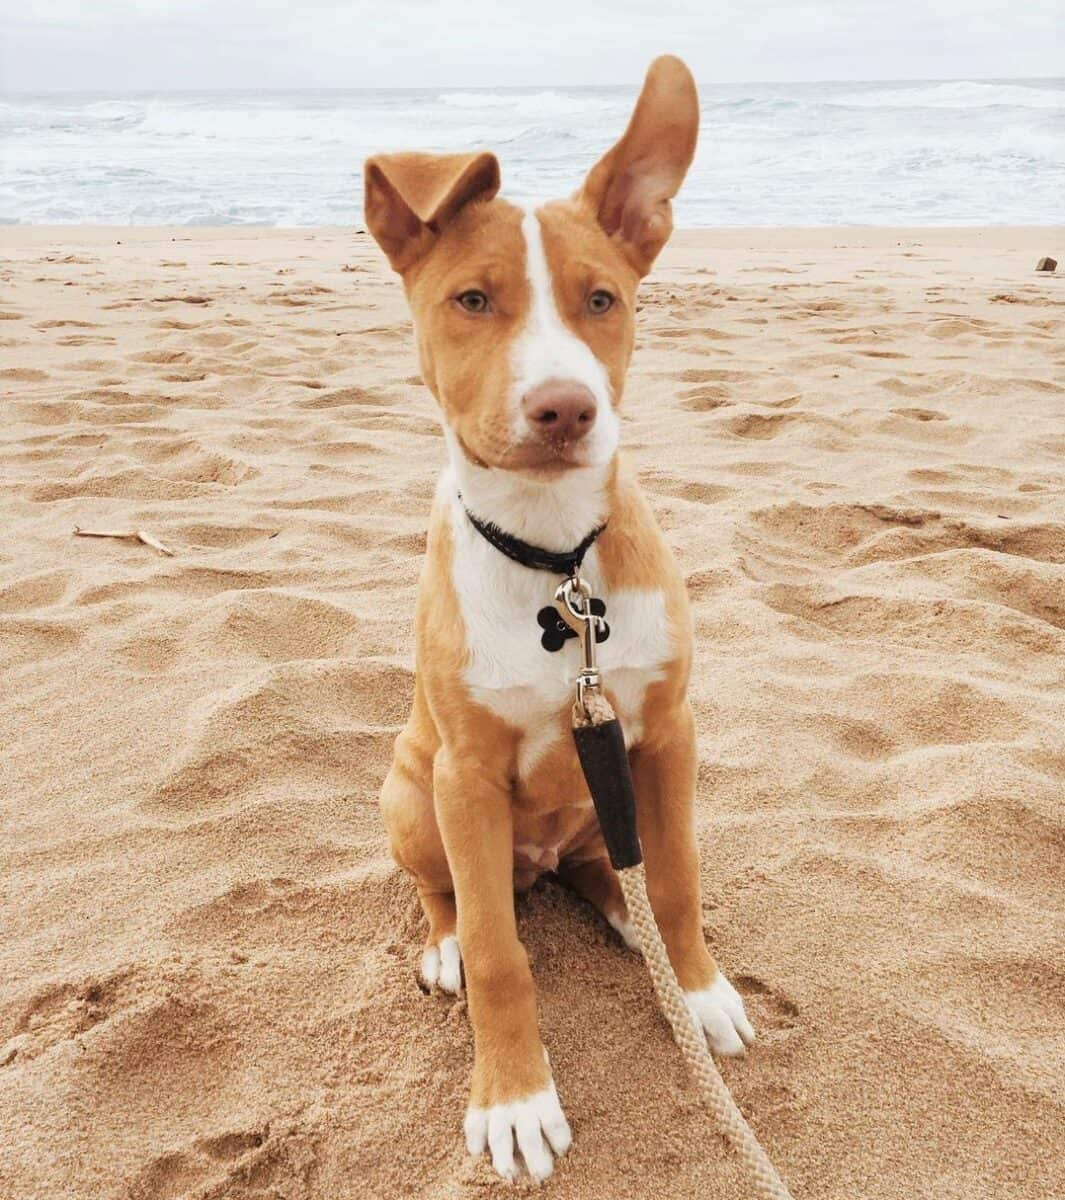 Tan Pitbull on the beach